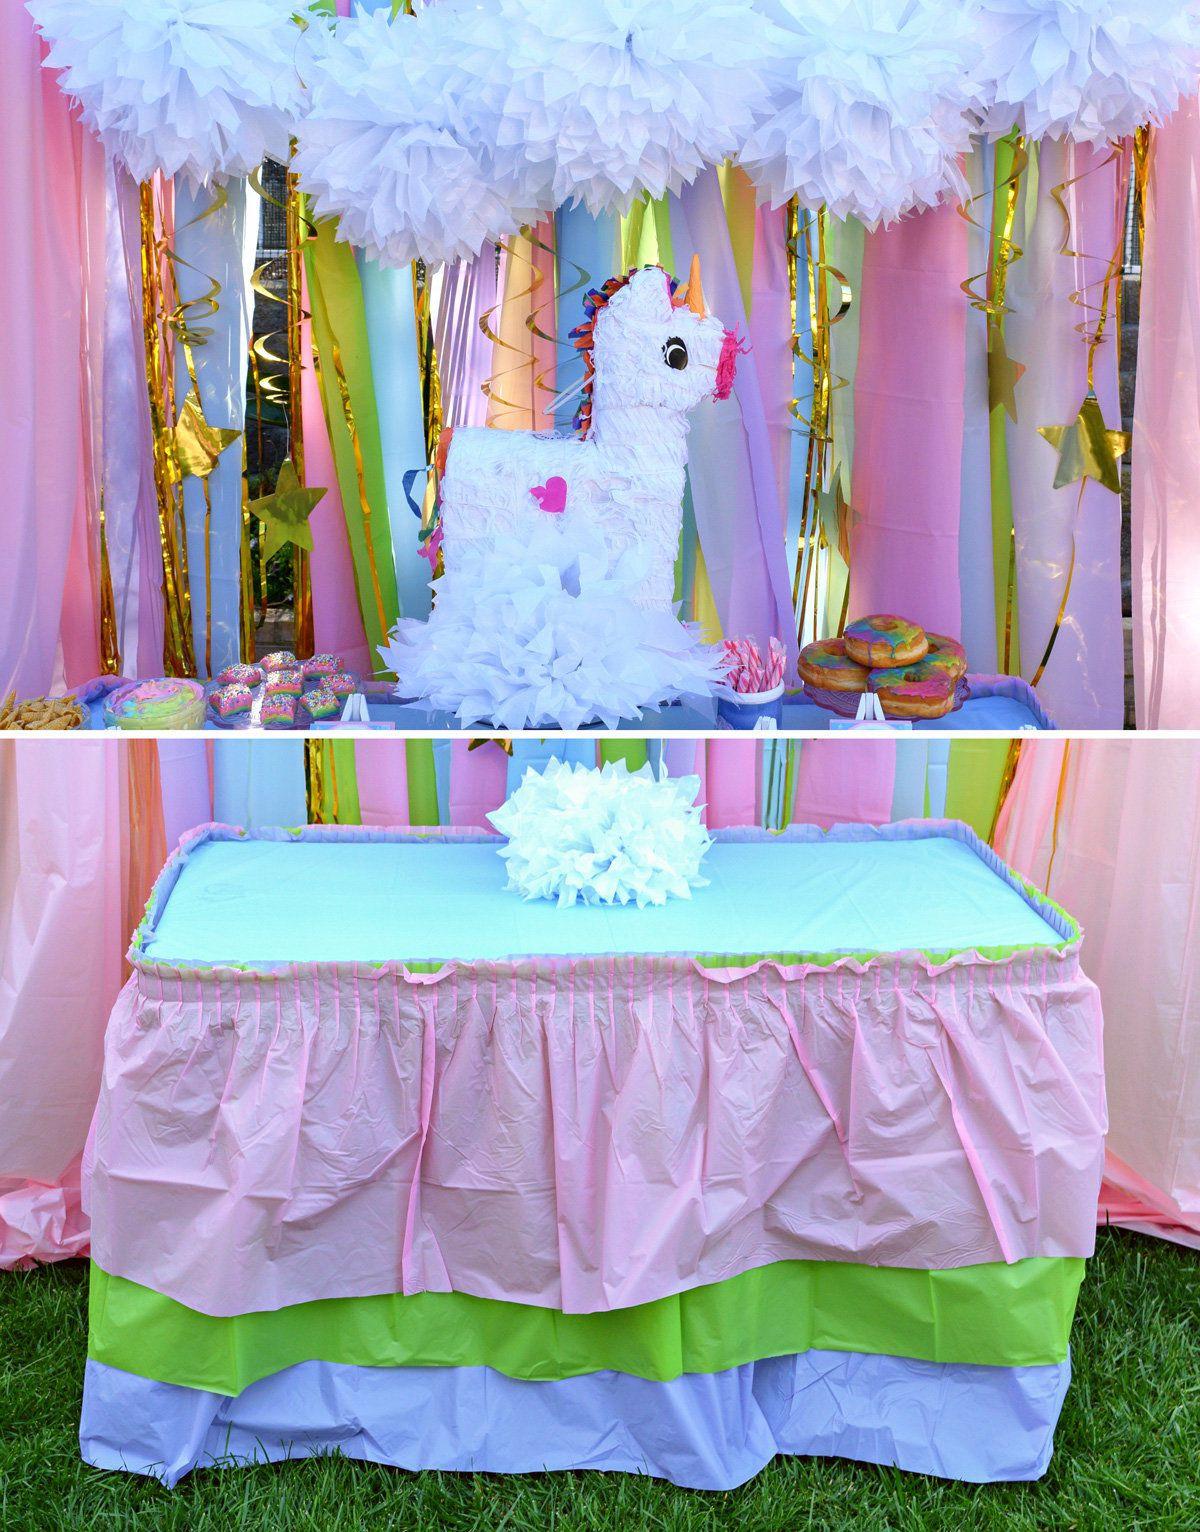 Unicorn Birthday Party Decorations Ideas  Unicorn Party Ideas